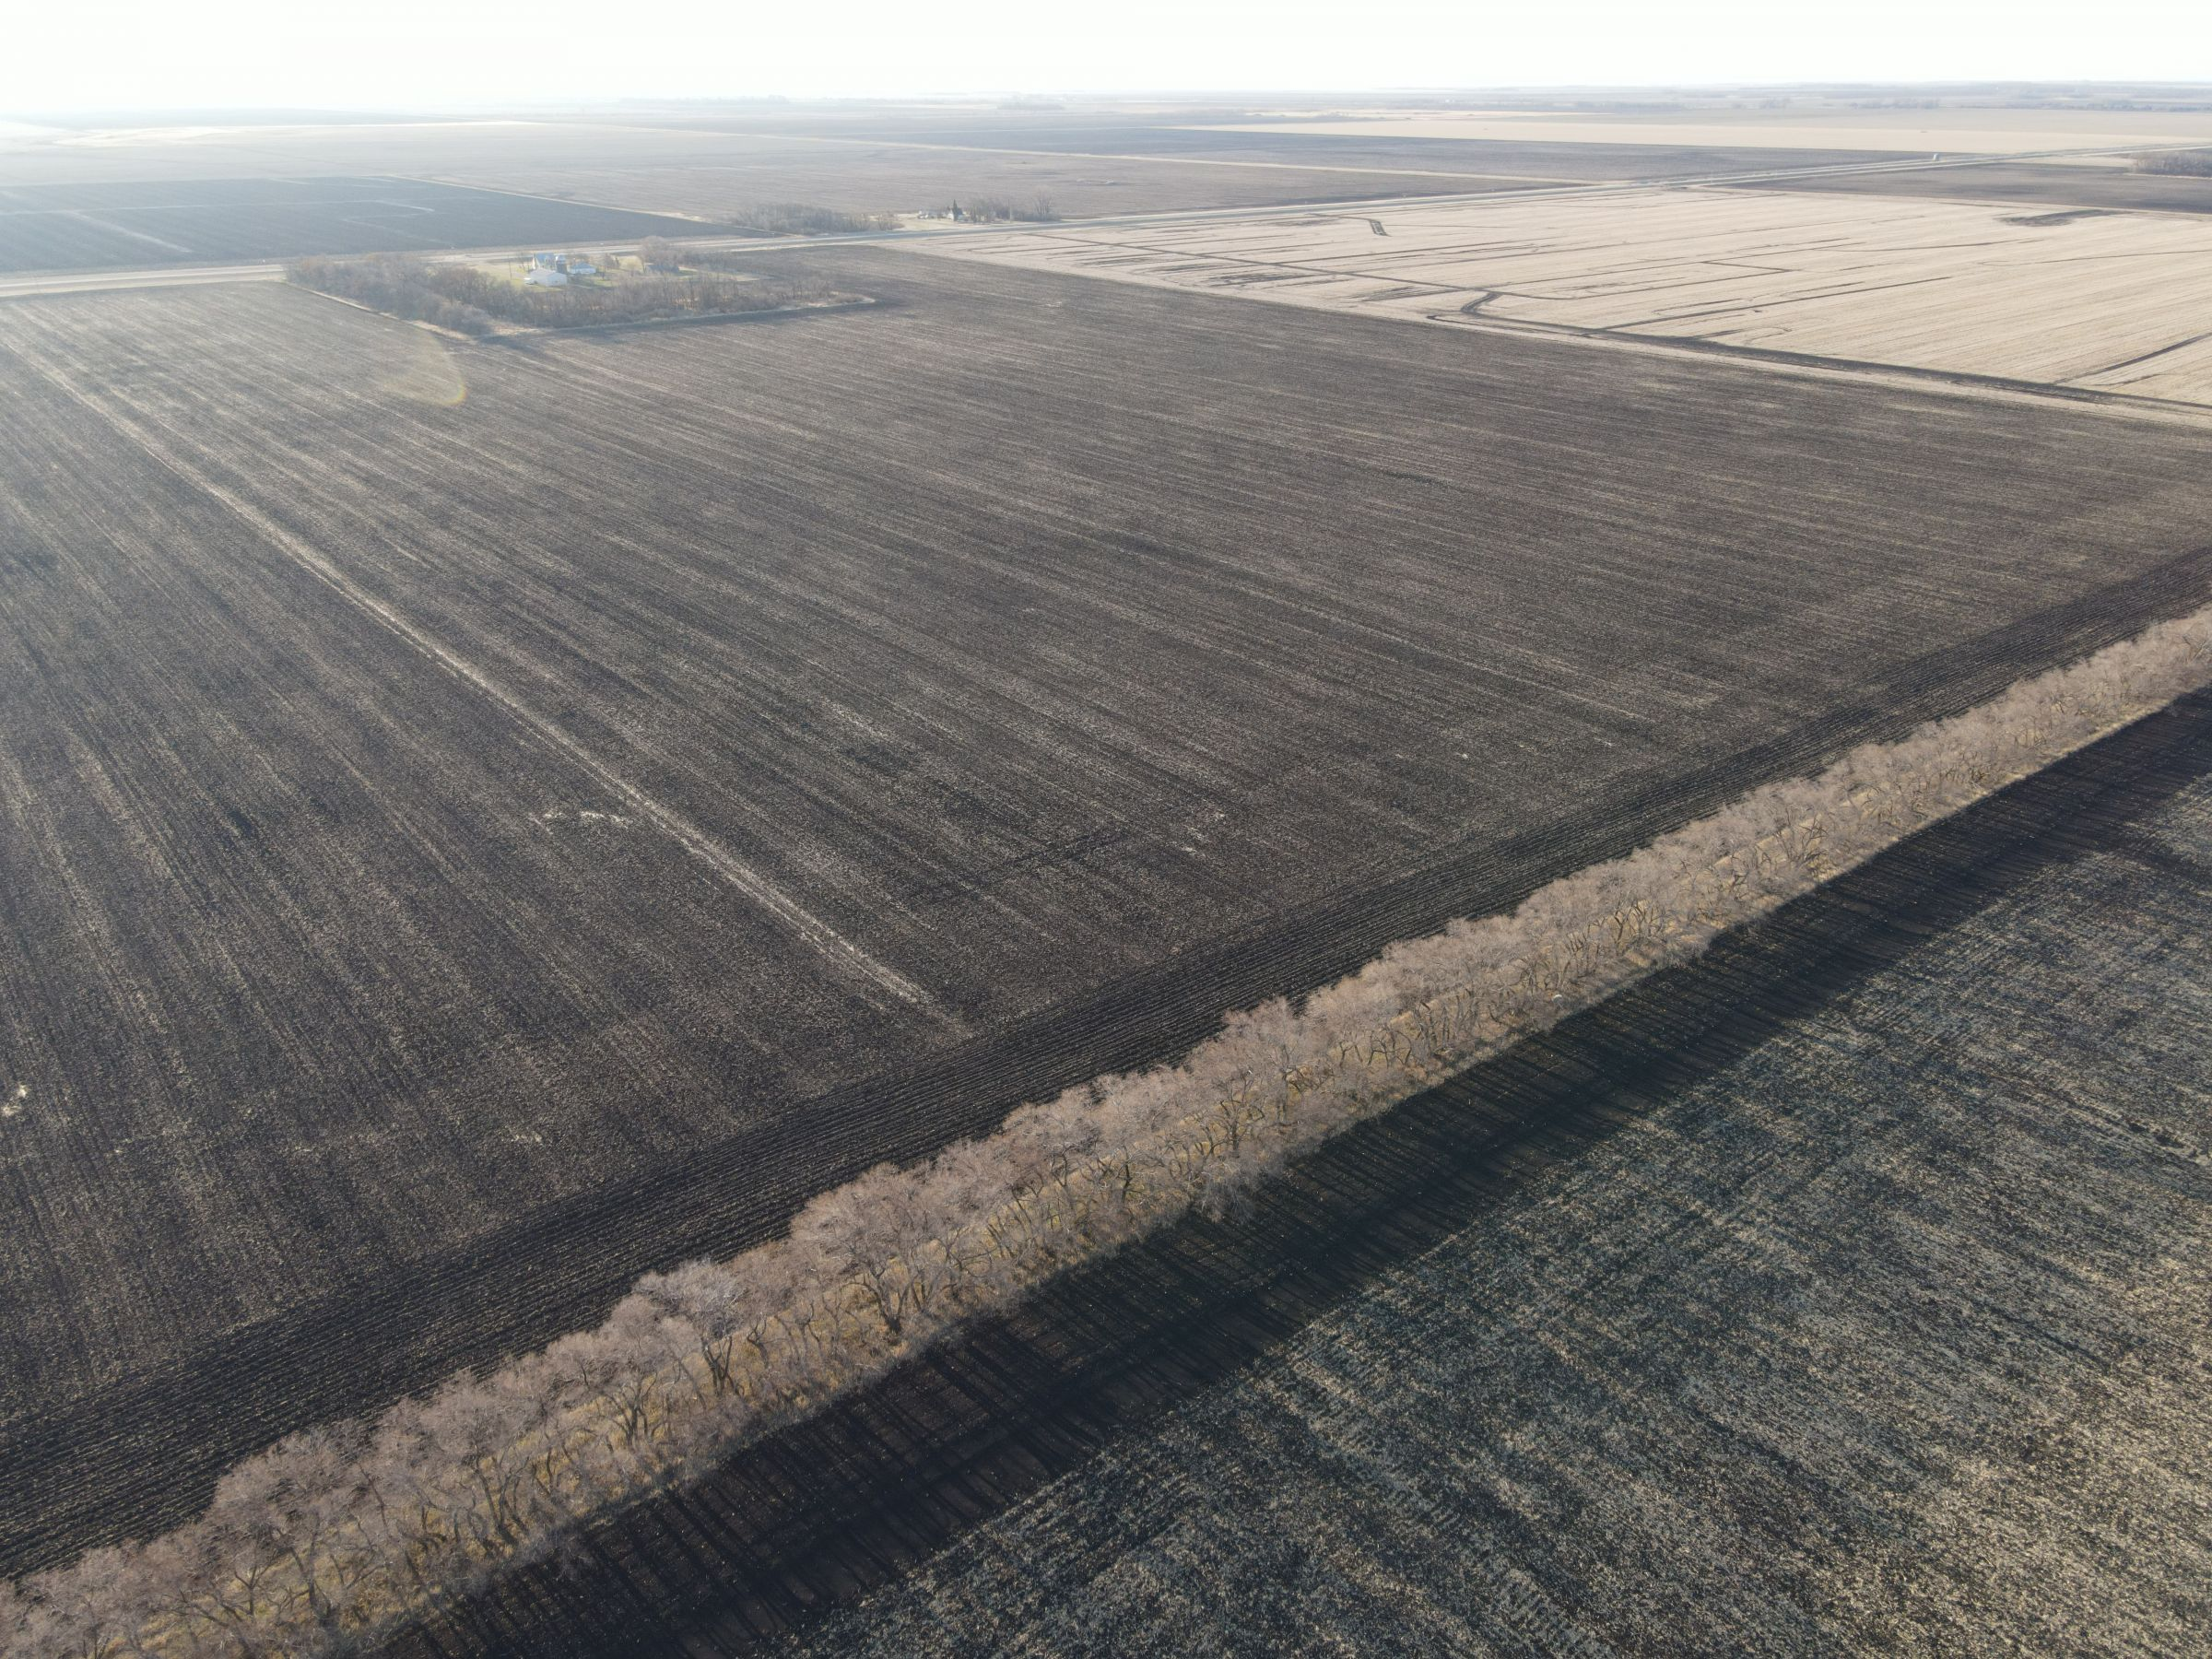 traill-county-north-dakota-74-acres-listing-number-15607-0-2021-06-22-201948.JPG